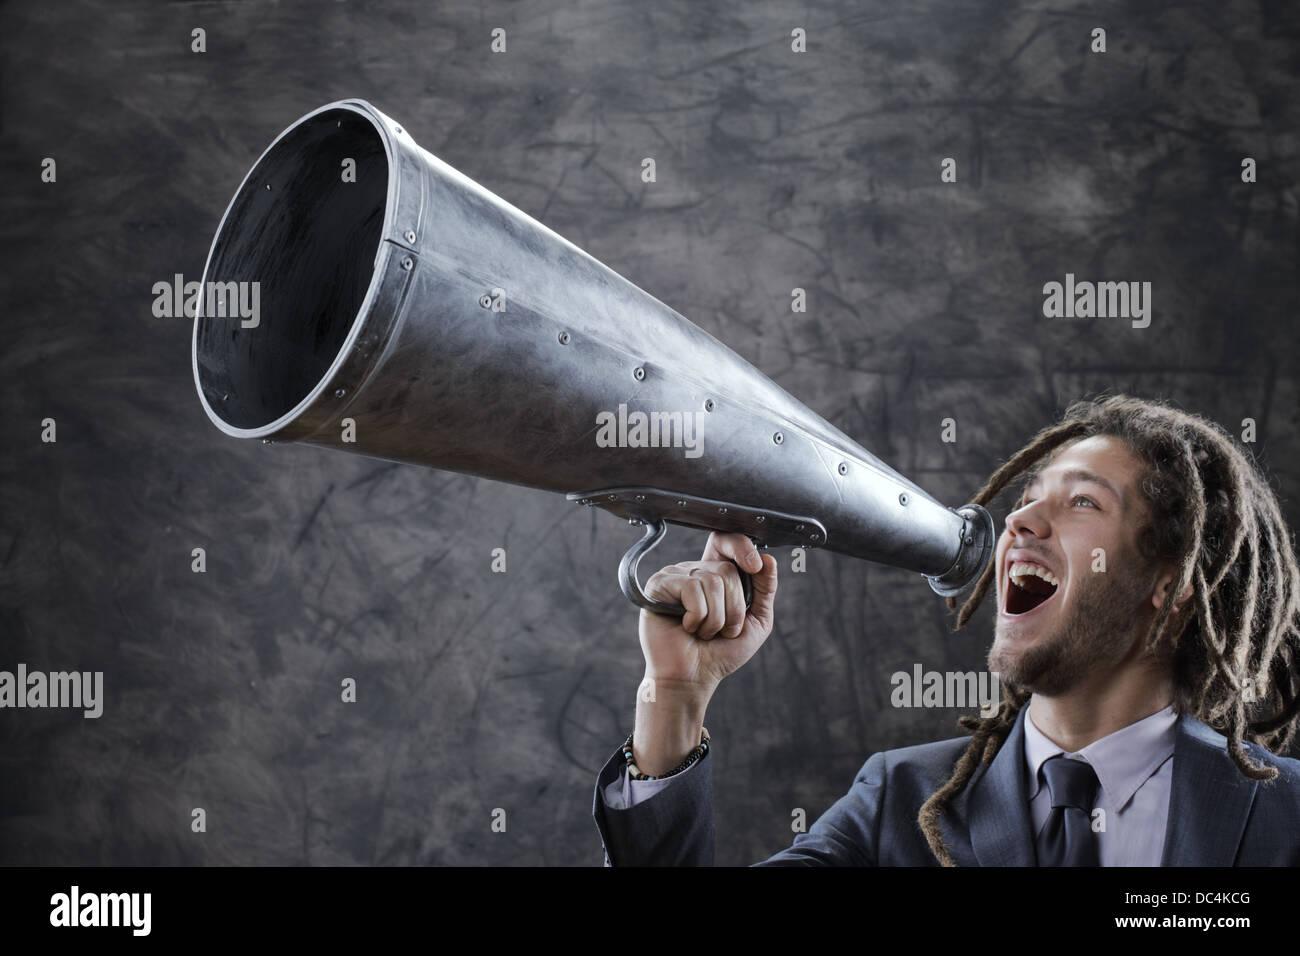 screaming into megaphone - Stock Image